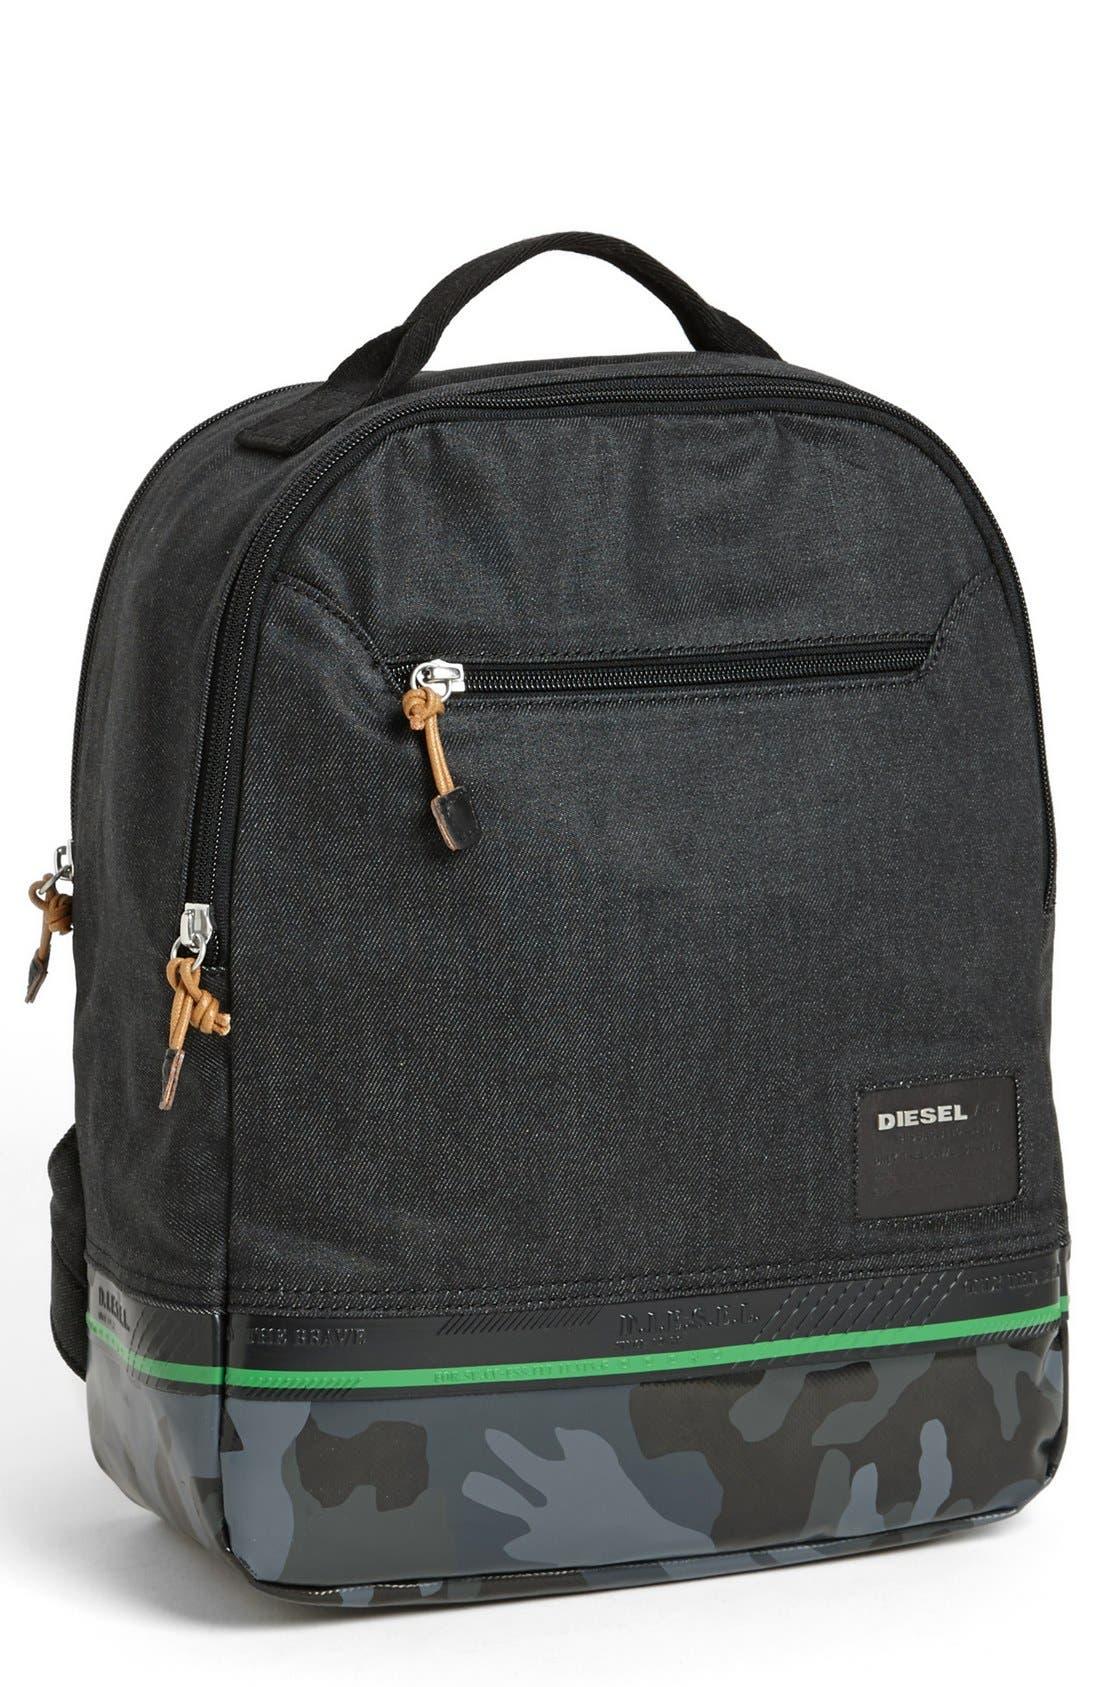 Main Image - DIESEL® 'Rubber Games' Backpack